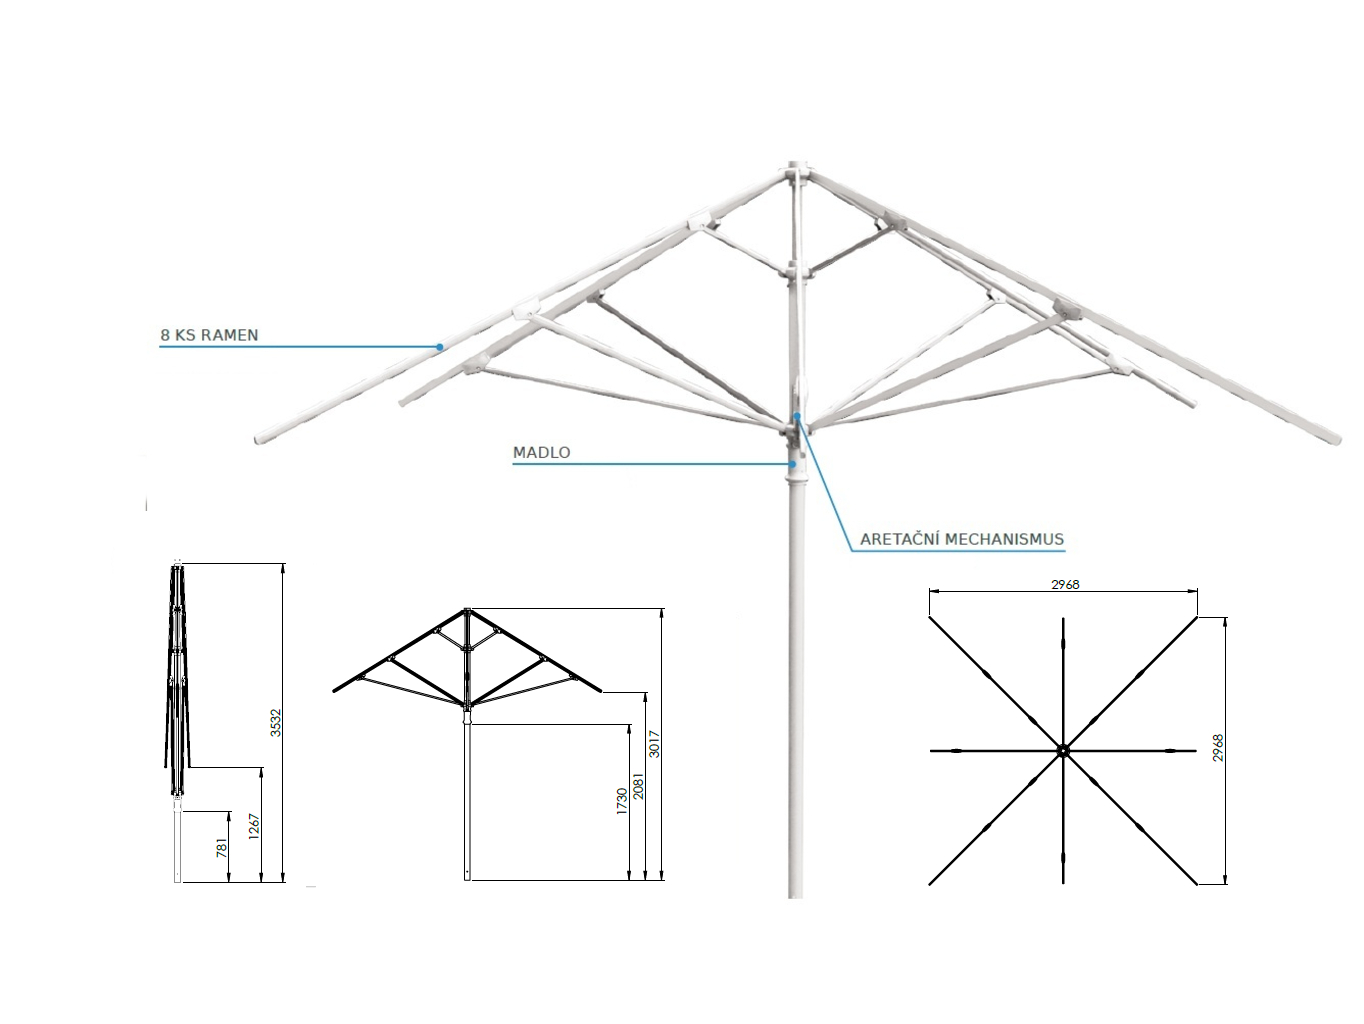 slunecnik-3-x-3-m-konstrukce